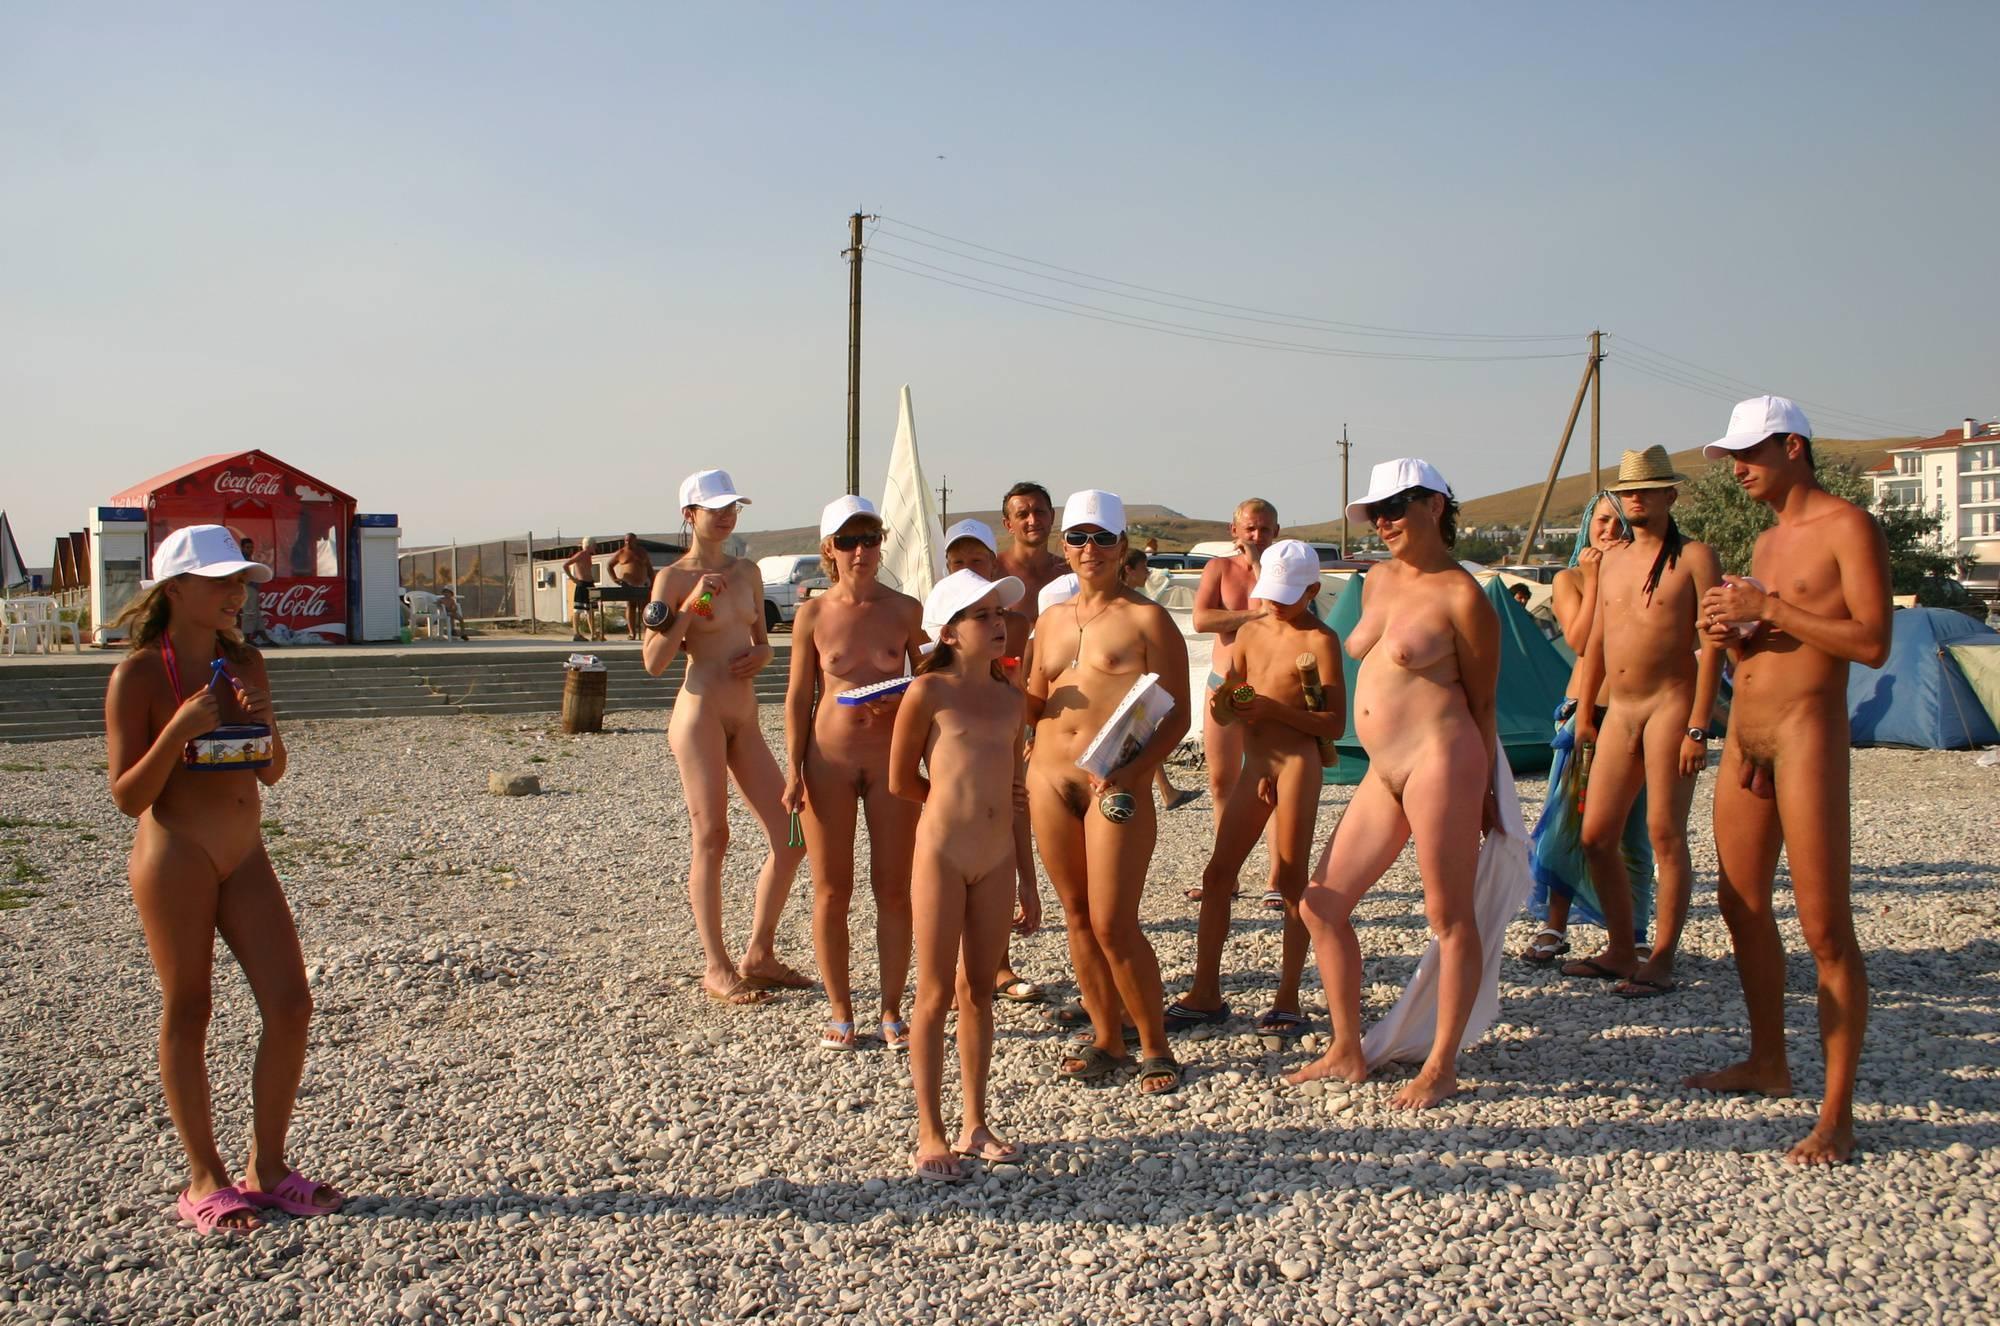 Nudist Family Flag Parade - 1